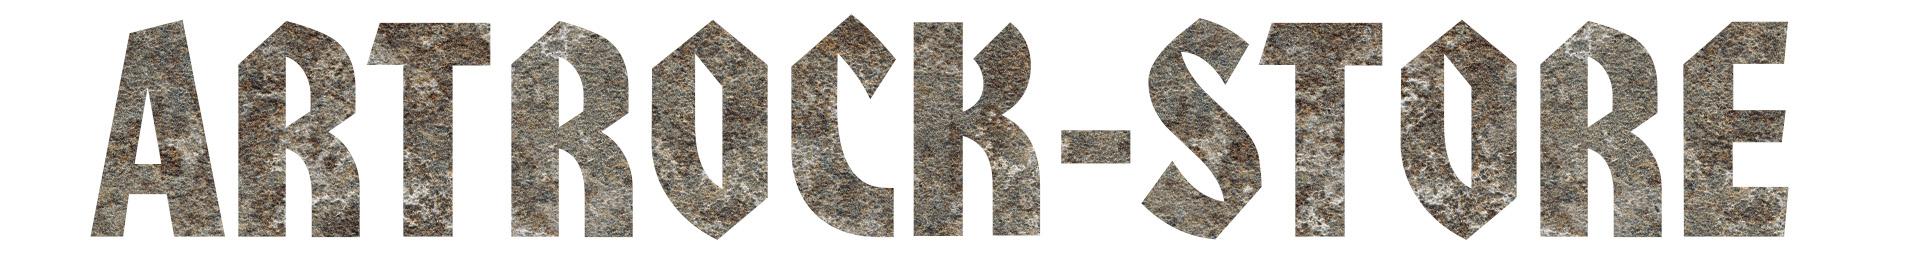 Интернет магазин гибкого камня ArtRock